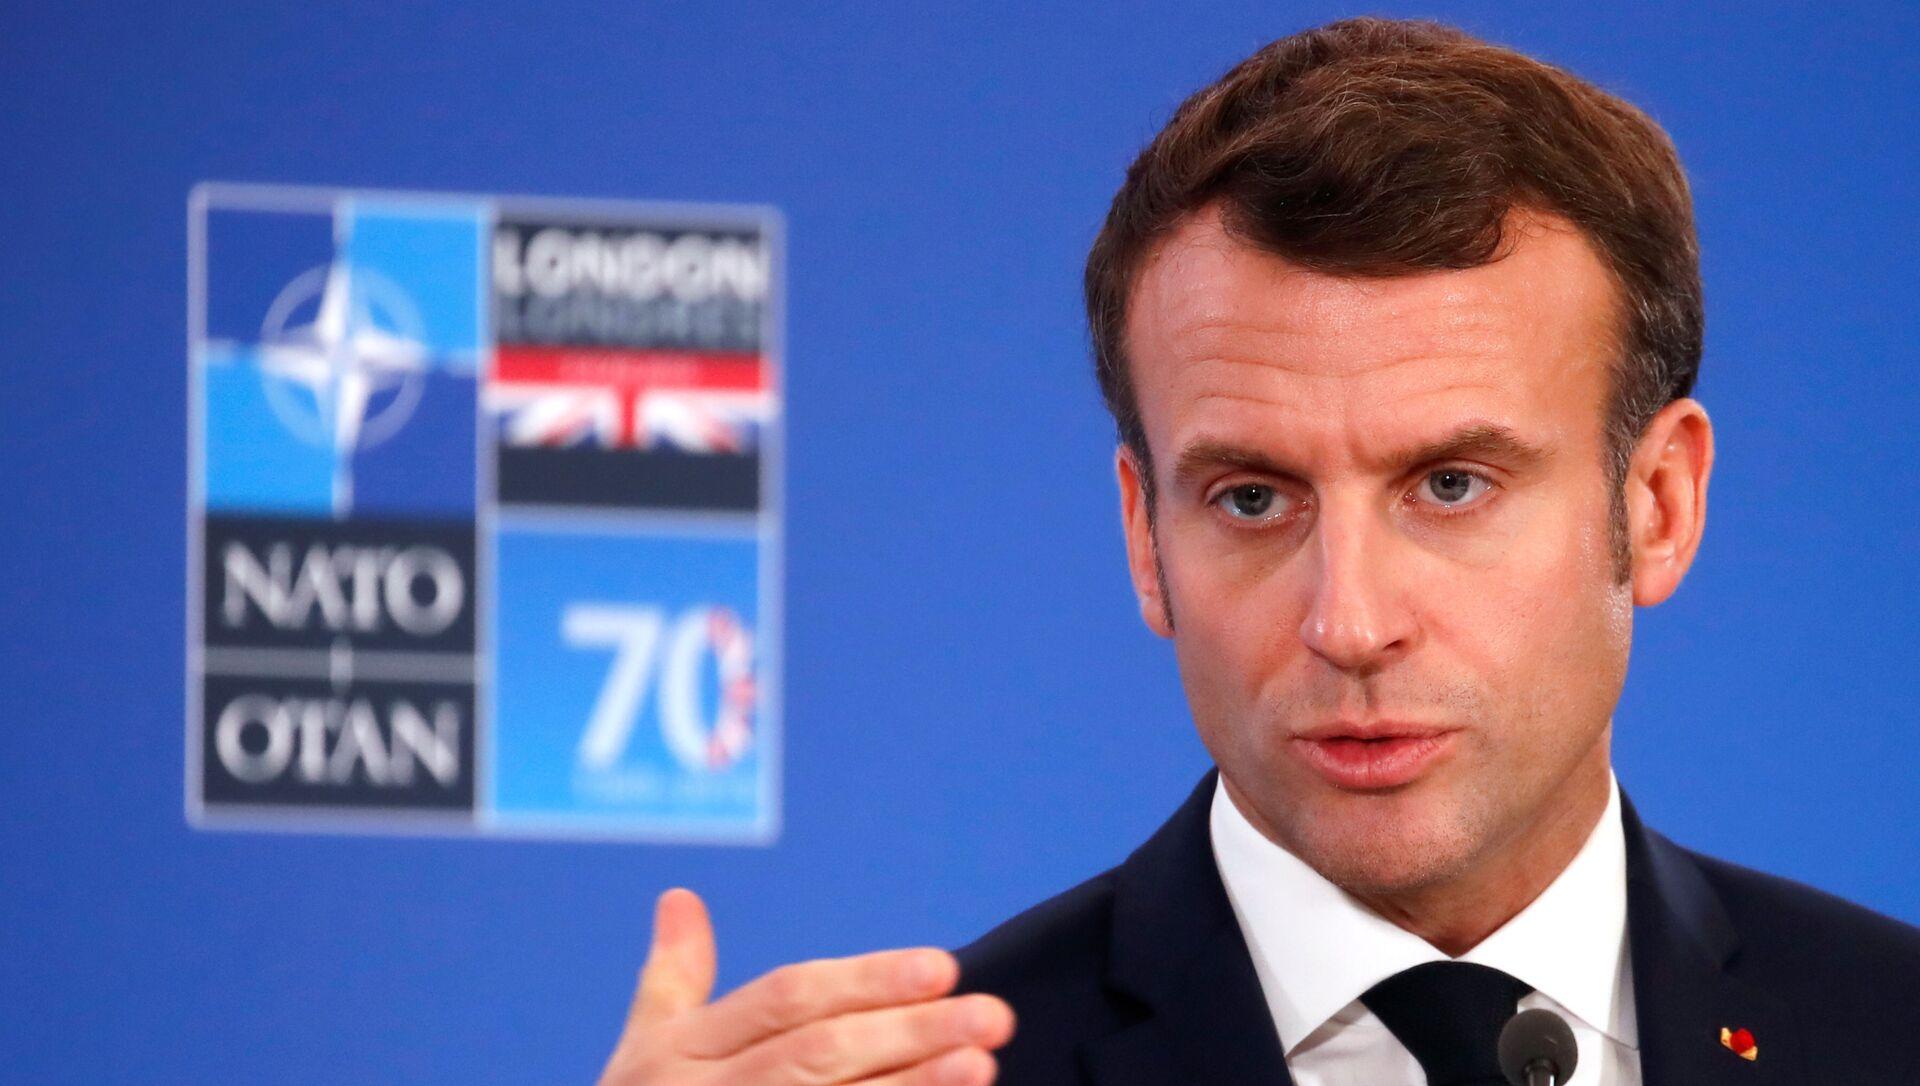 Emmanuel Macron, presidente de Francia - Sputnik Mundo, 1920, 04.12.2019